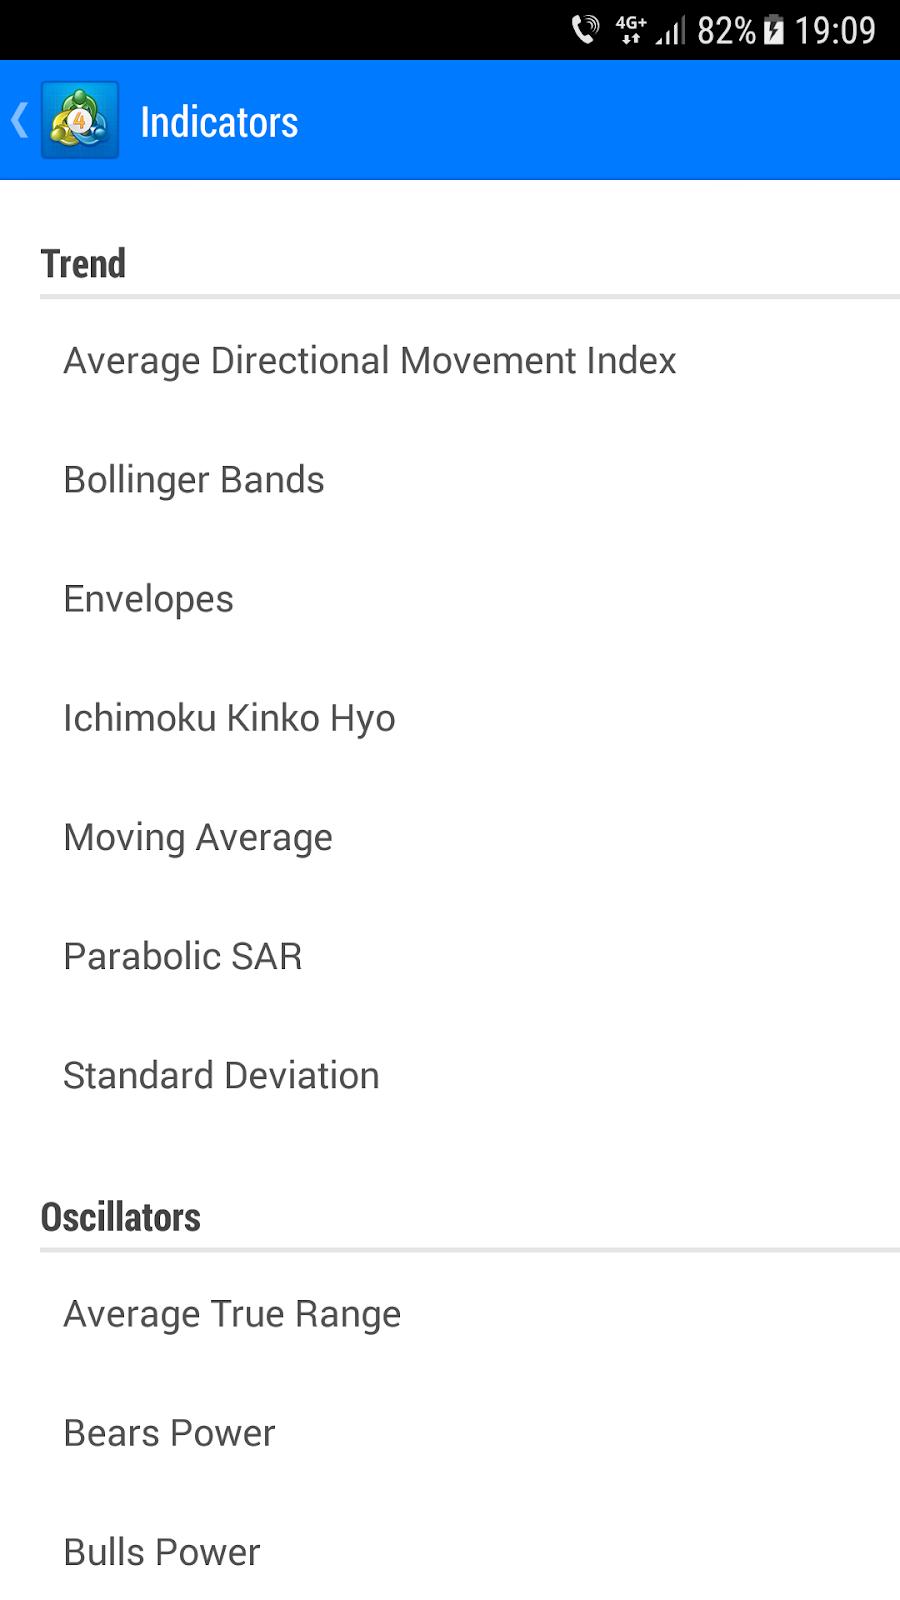 indicatori metatrader 4 android